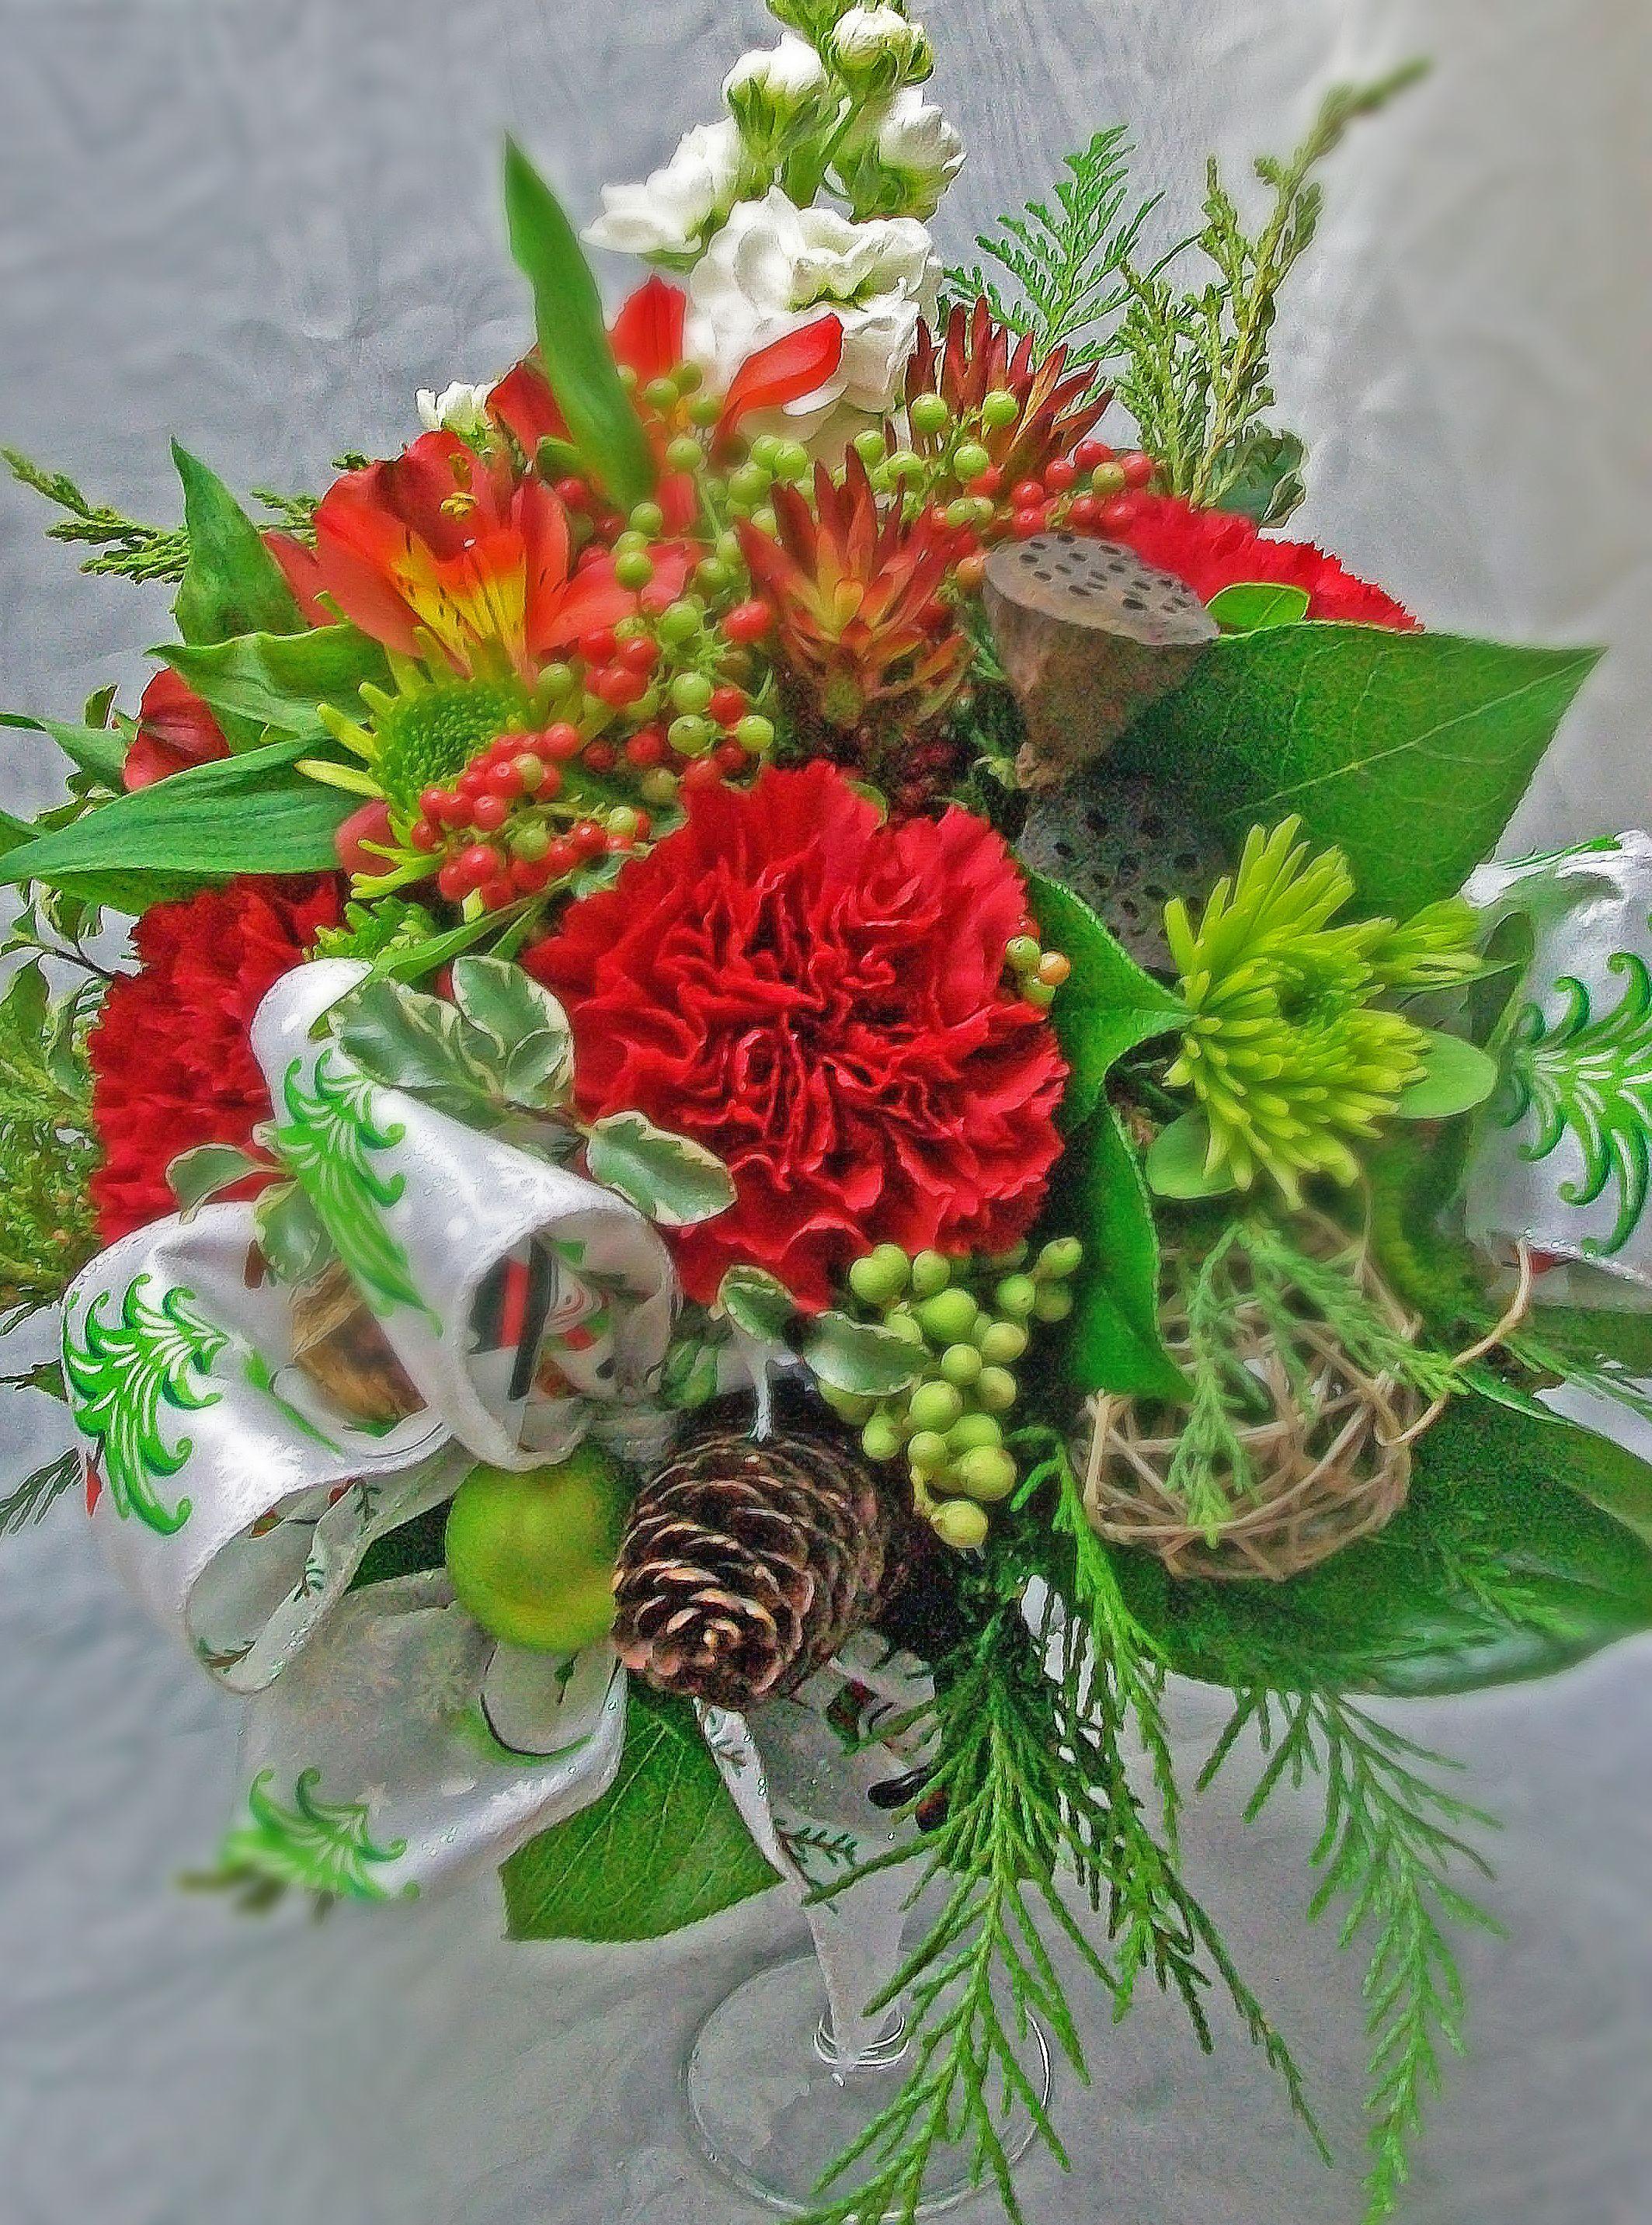 Holiday red and green stemmed glass vase organic enhancements holiday red and green stemmed glass vase organic enhancements carnations mums glass vasehappy holidaysfloristssan diego izmirmasajfo